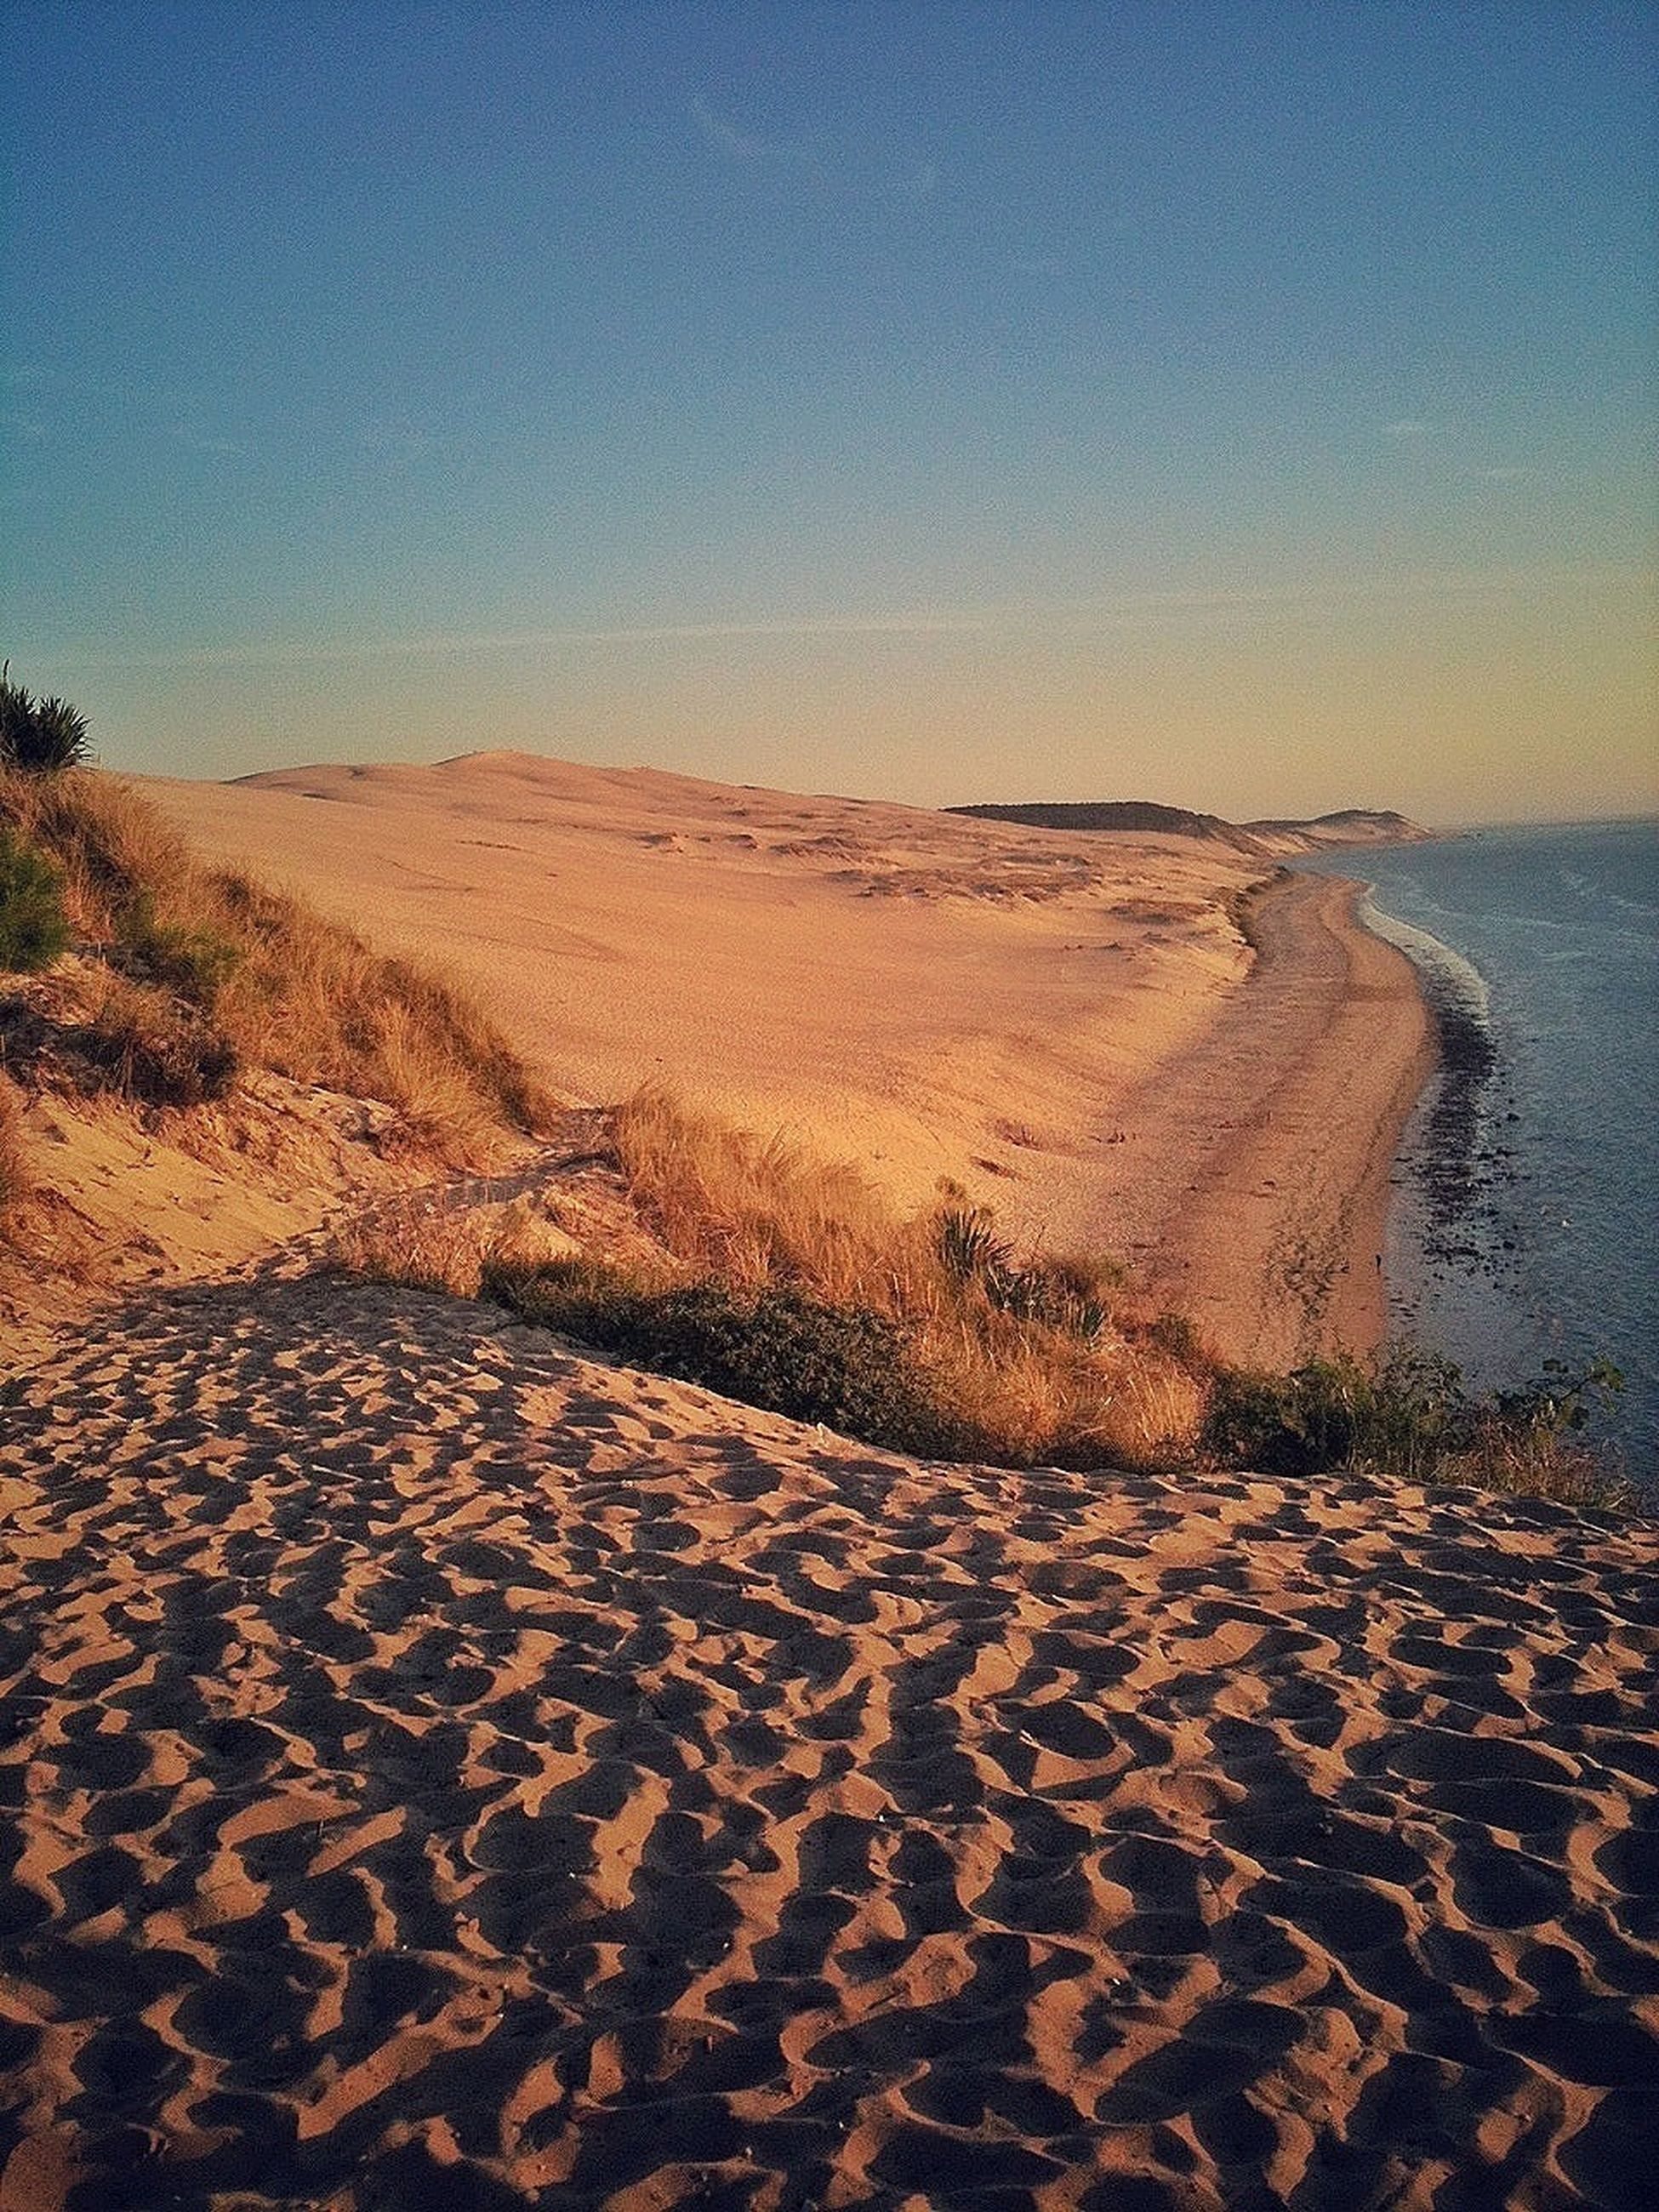 sand, beach, sea, tranquility, tranquil scene, shore, water, clear sky, scenics, beauty in nature, nature, horizon over water, copy space, coastline, idyllic, sky, remote, desert, non-urban scene, footprint